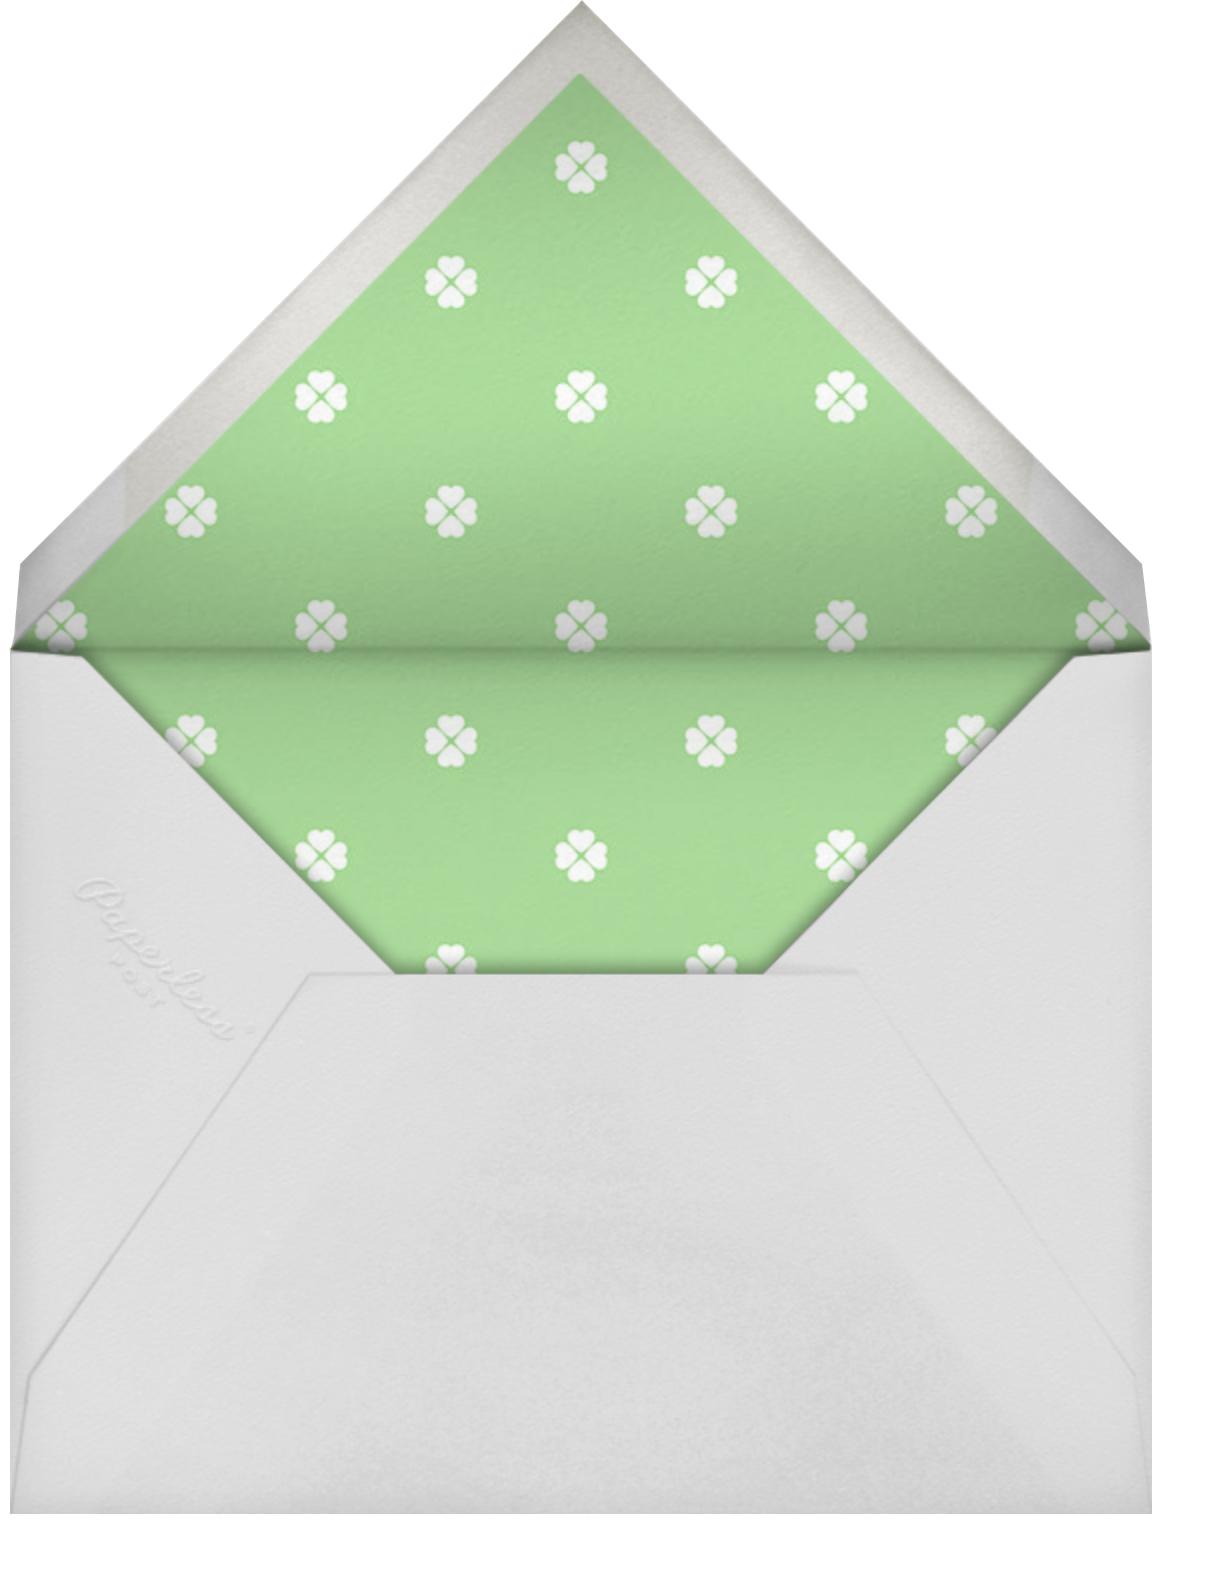 Colorblocked Stripes - Lemon Drop/Meadow - kate spade new york - Adult birthday - envelope back